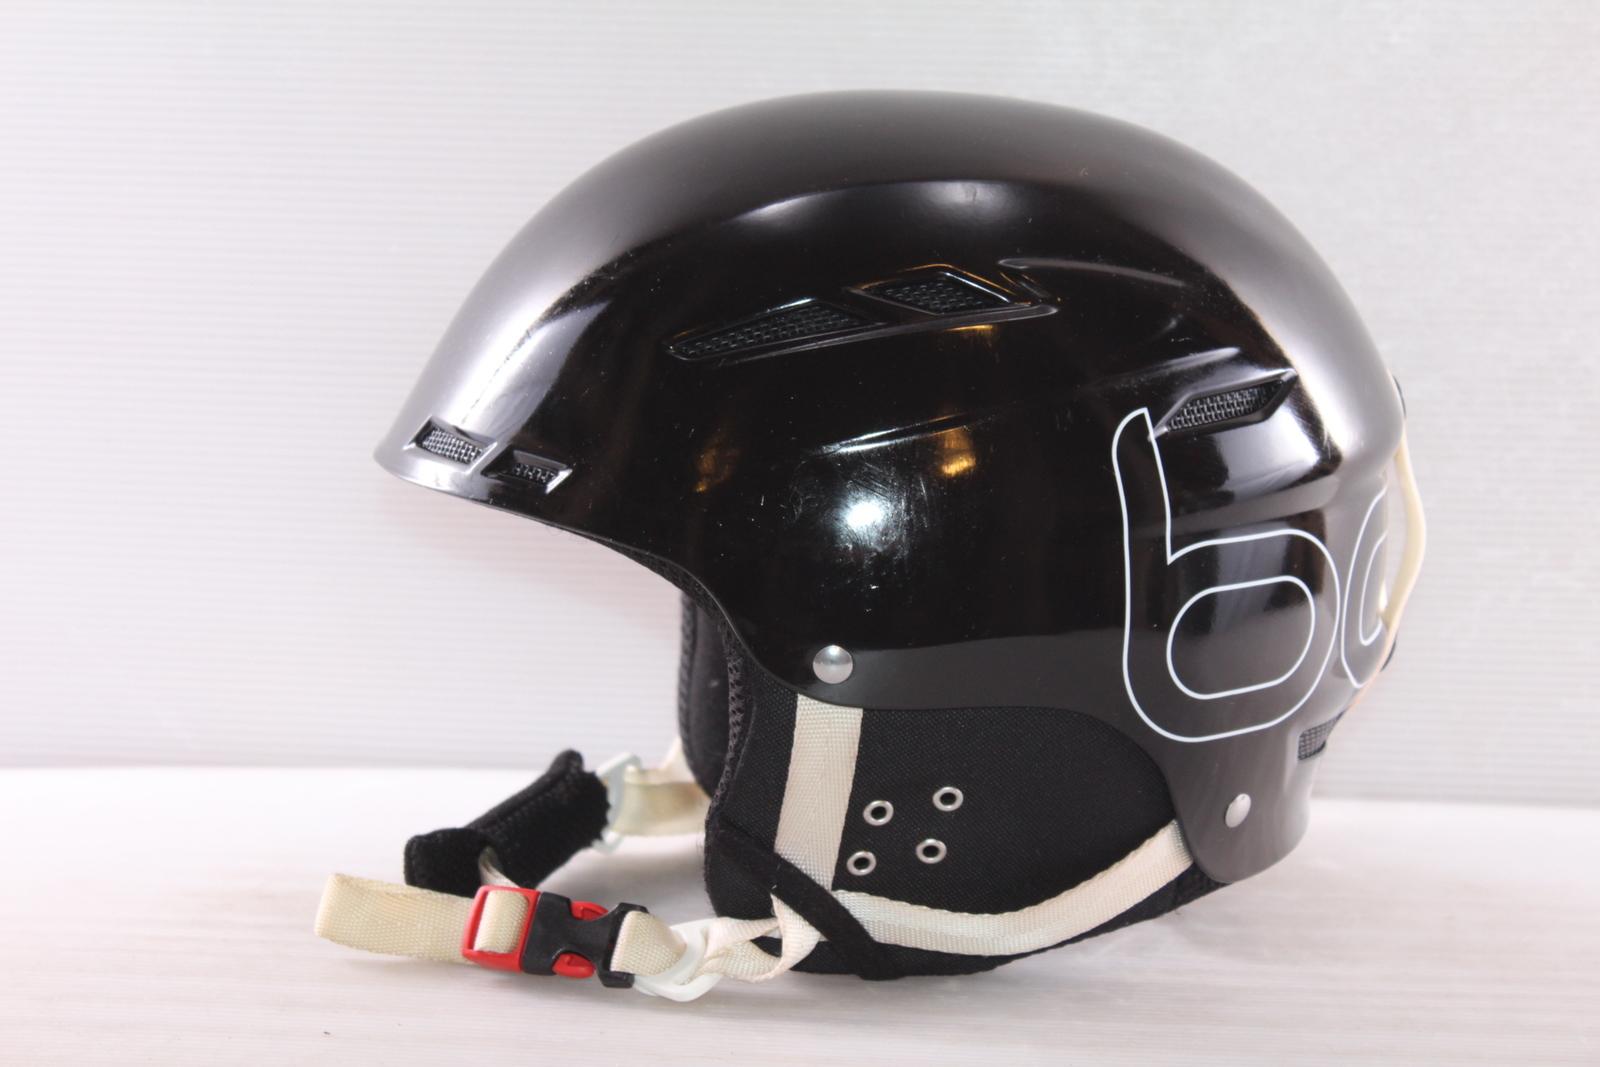 Dámská lyžařská helma Bolle B-Fun - posuvná vel. 58 - 61